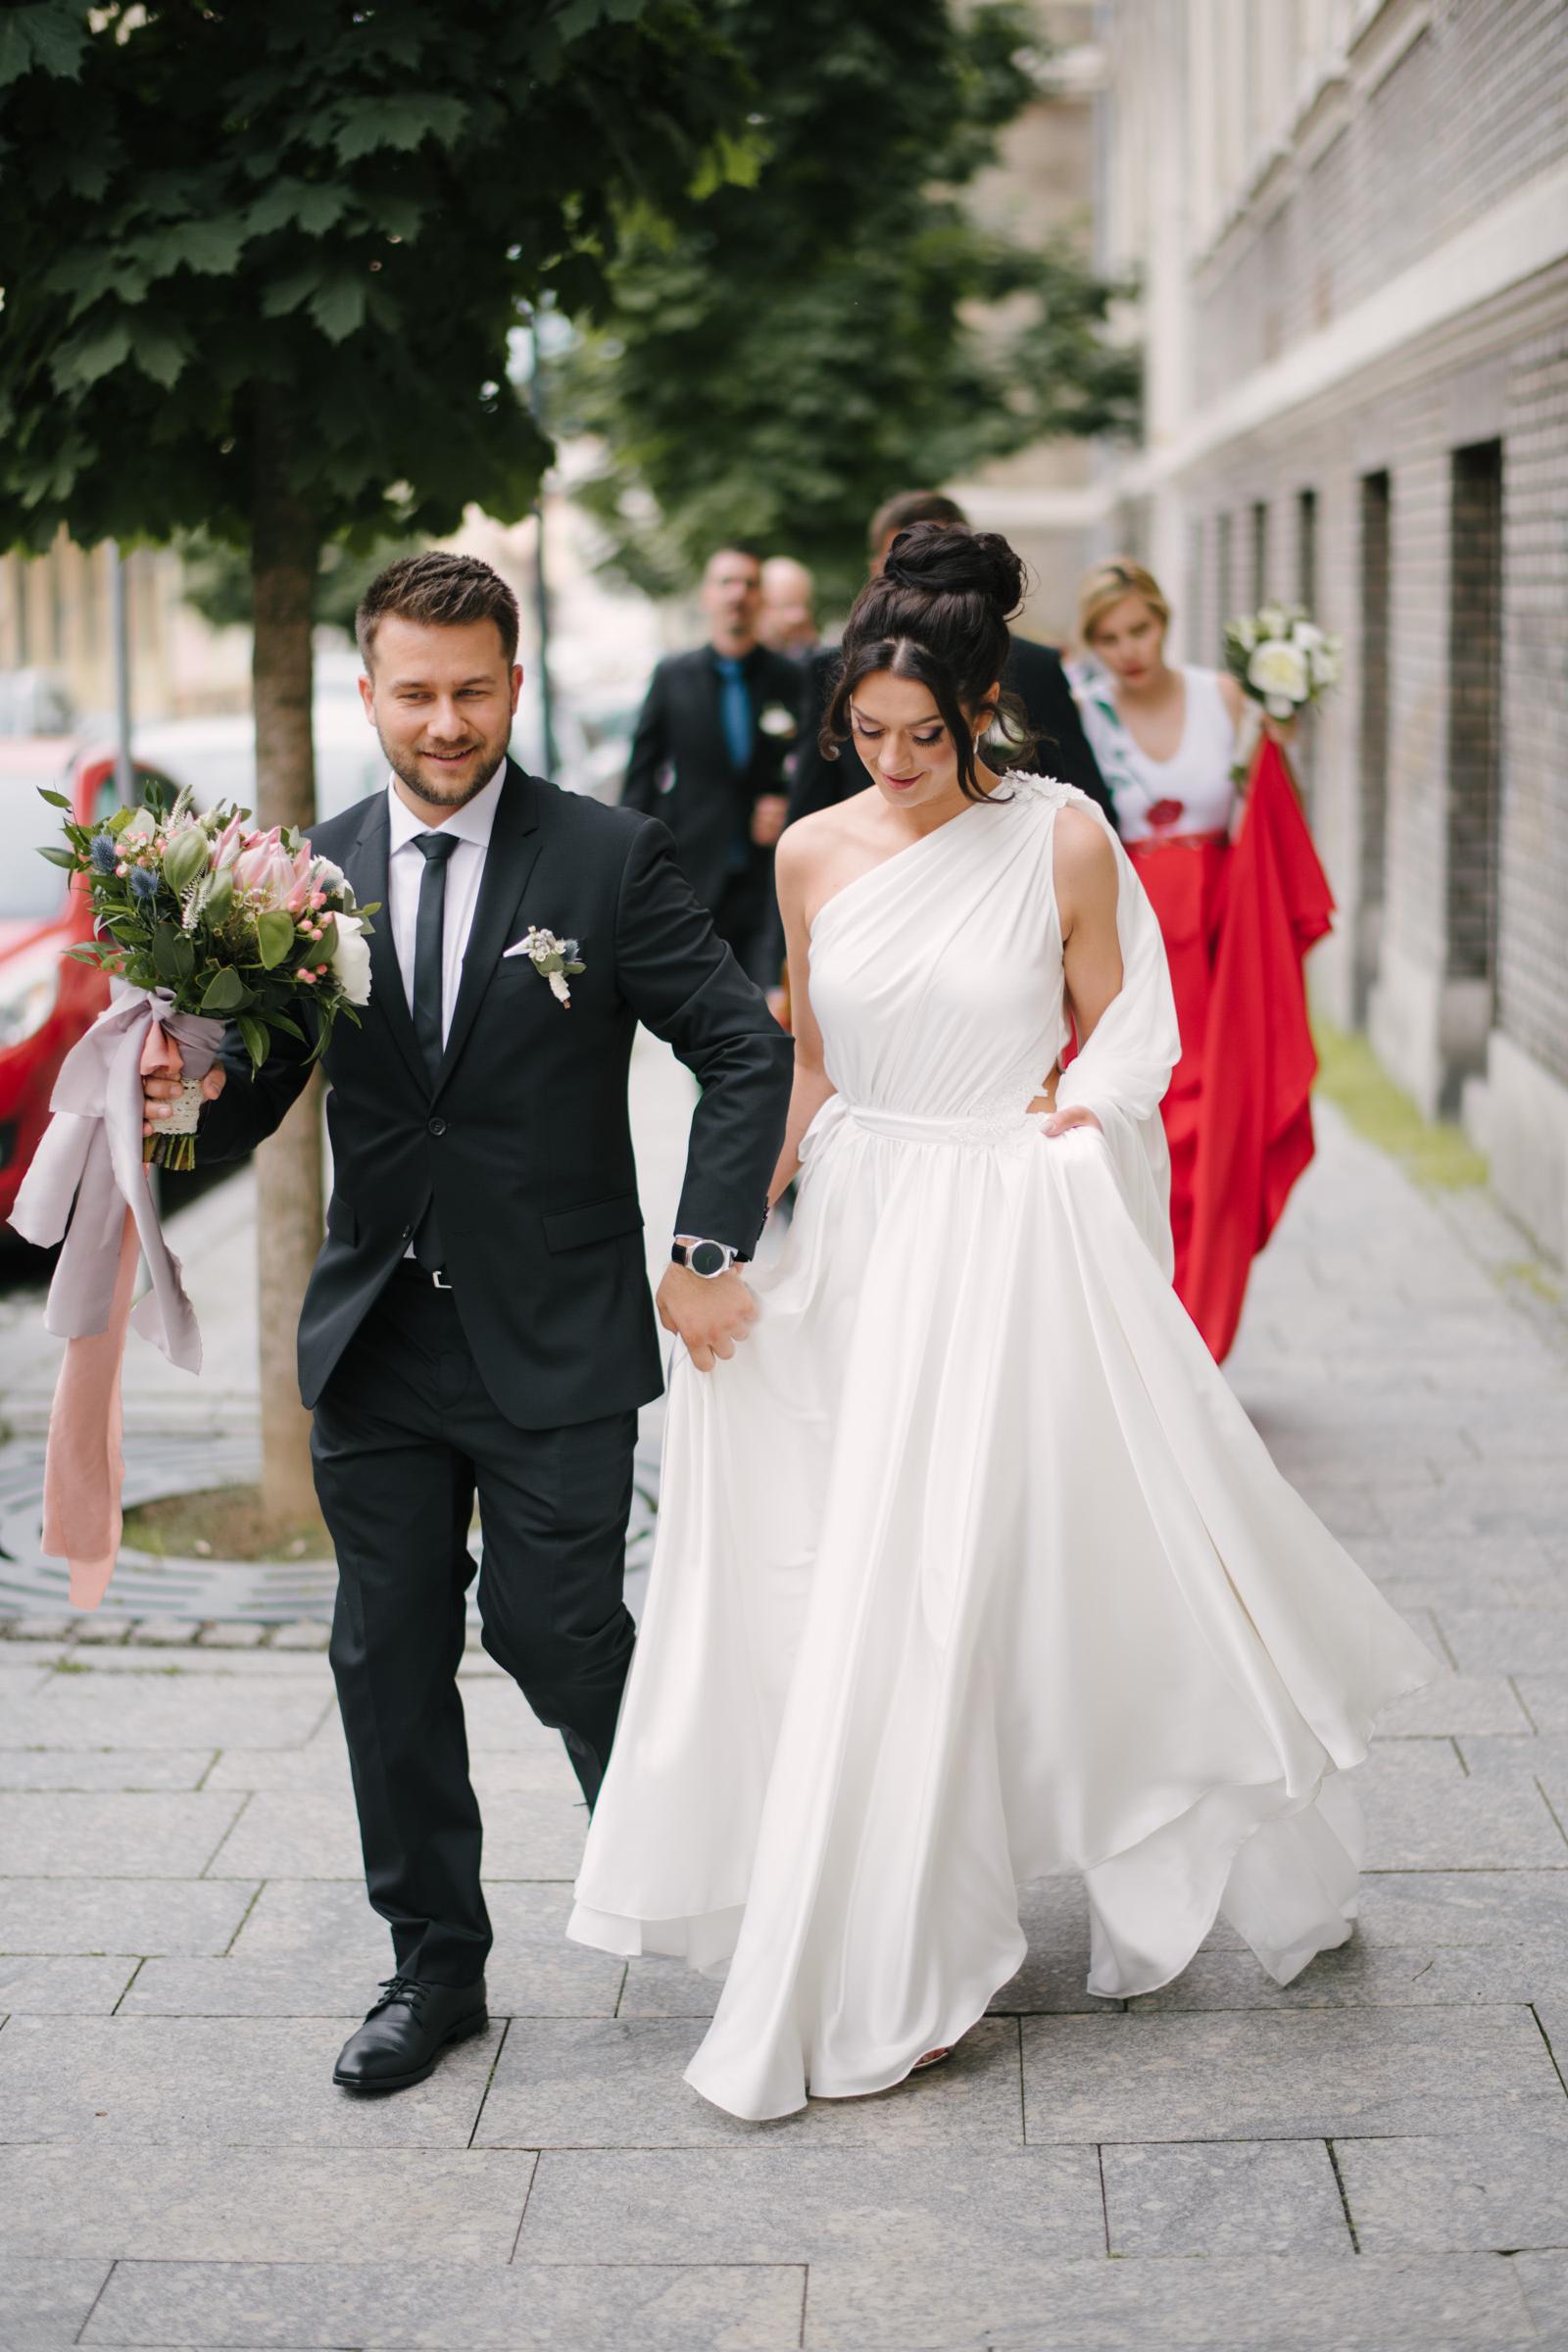 Cluj Napoca Wedding Photographer